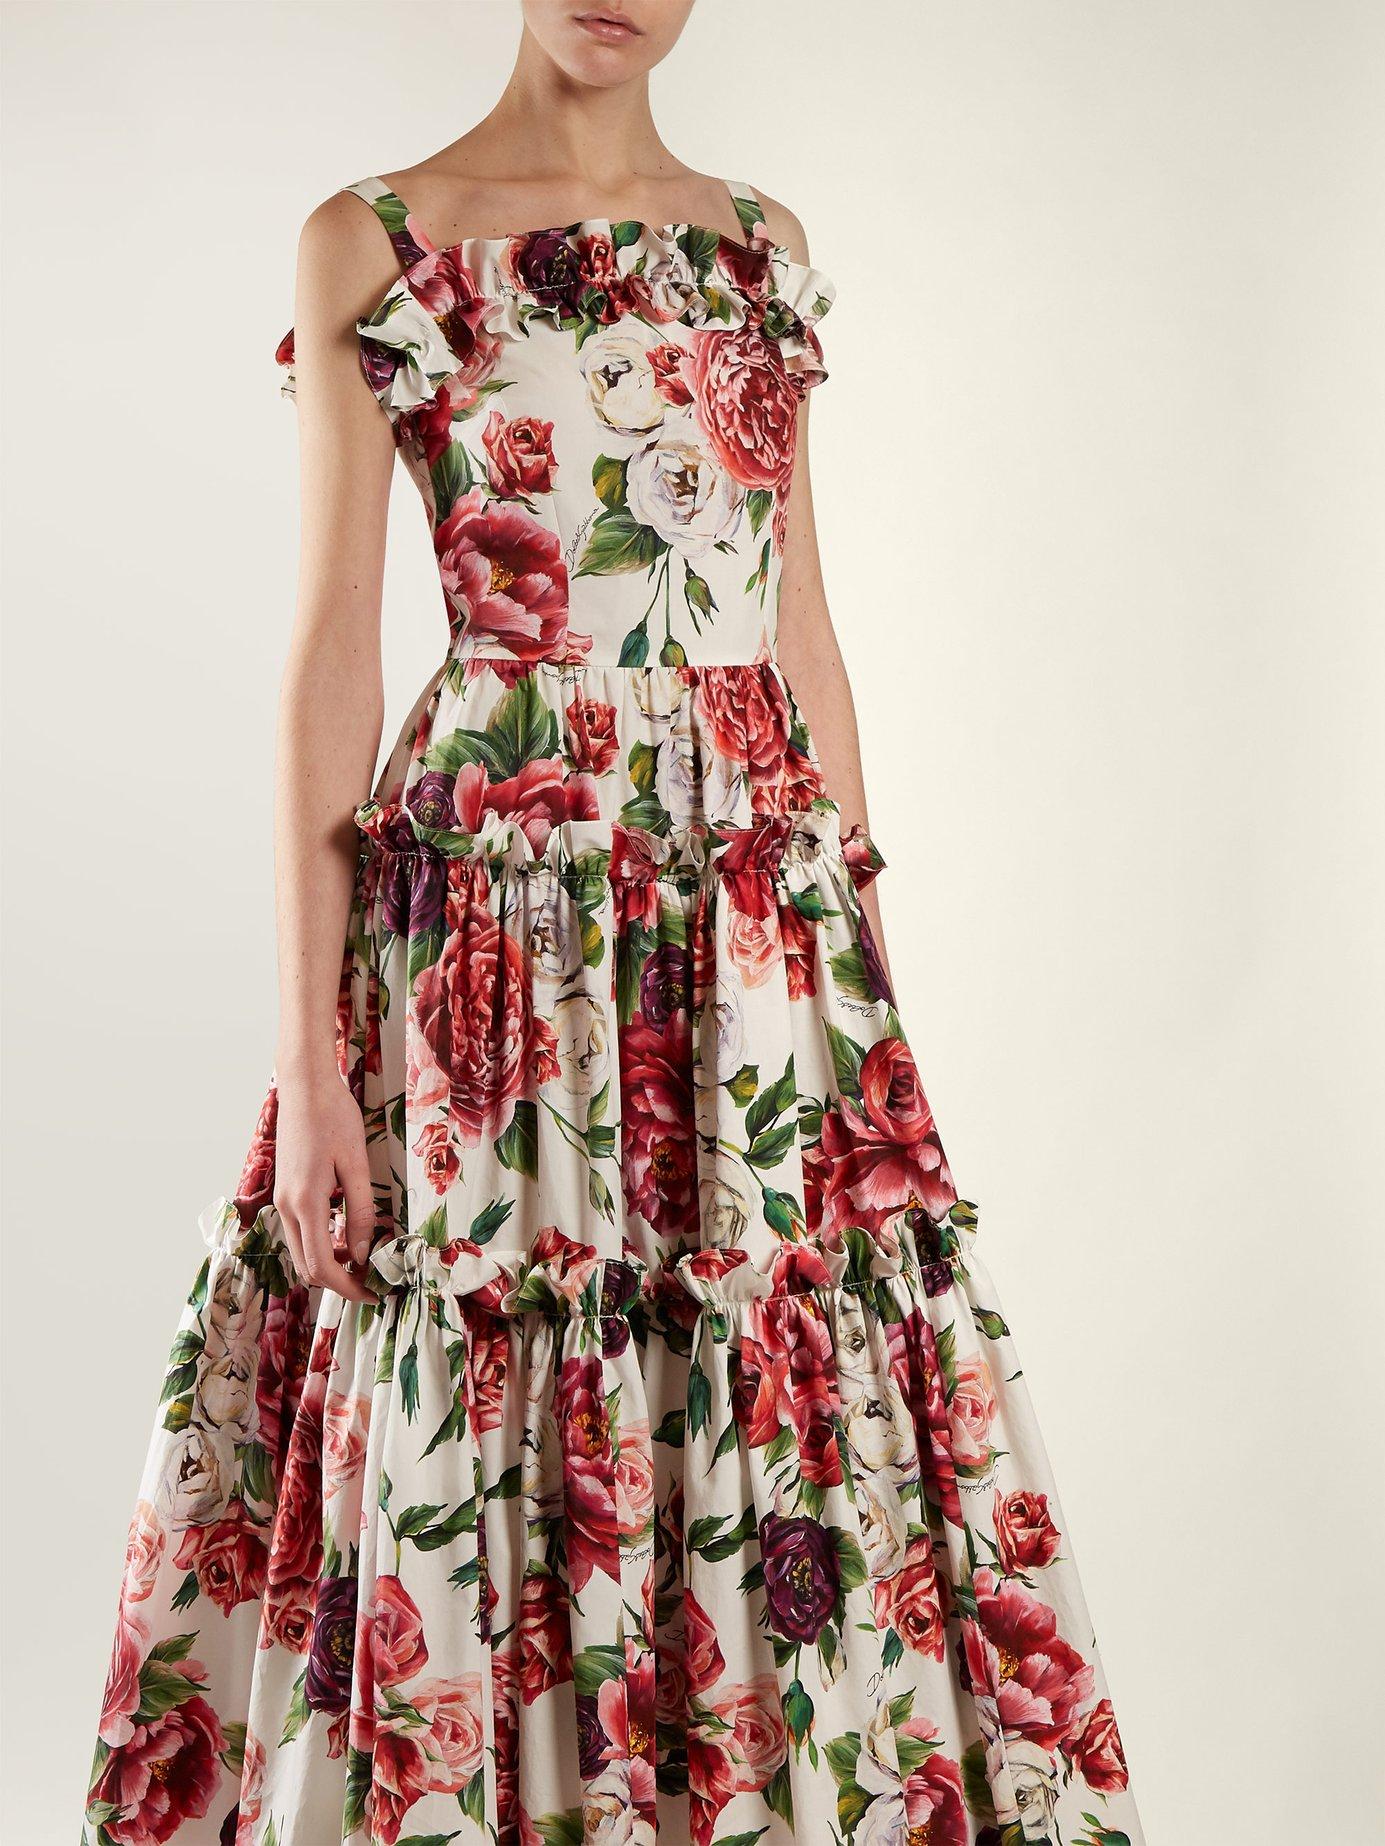 Peony and rose-print cotton poplin dress by Dolce & Gabbana